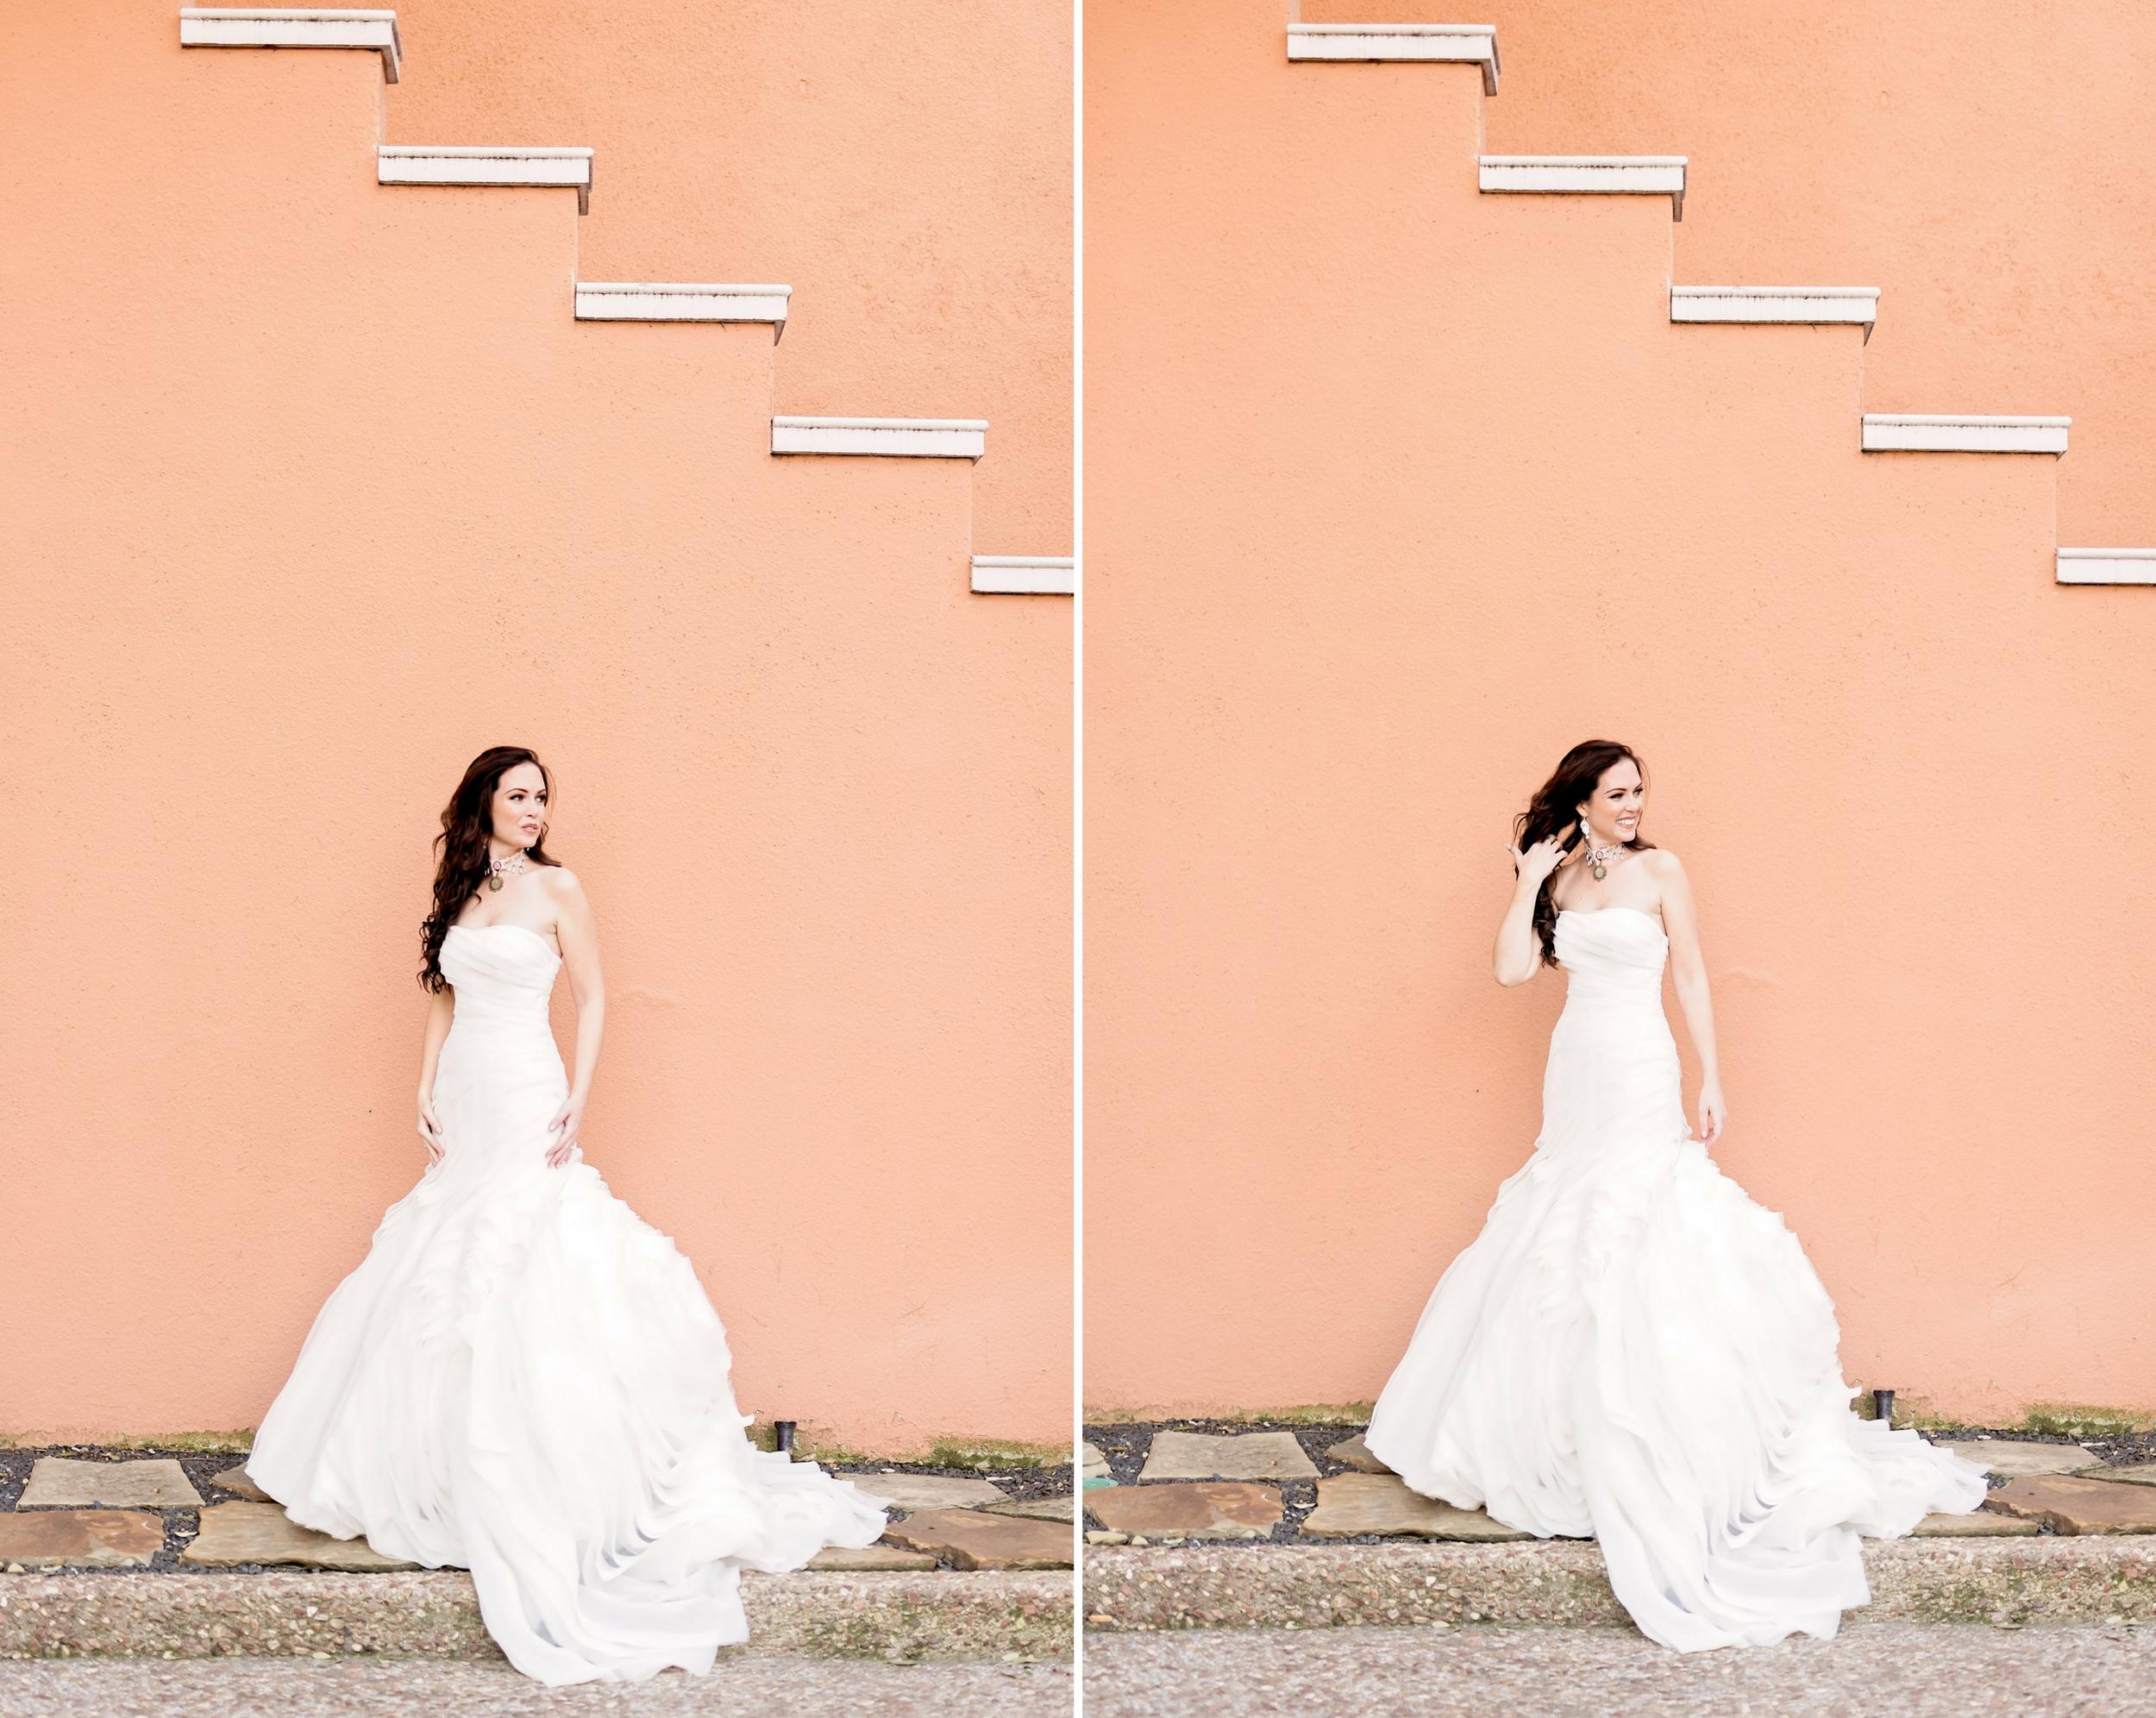 Heather-Jack-Wedding-Pharris-Photography-10.jpg